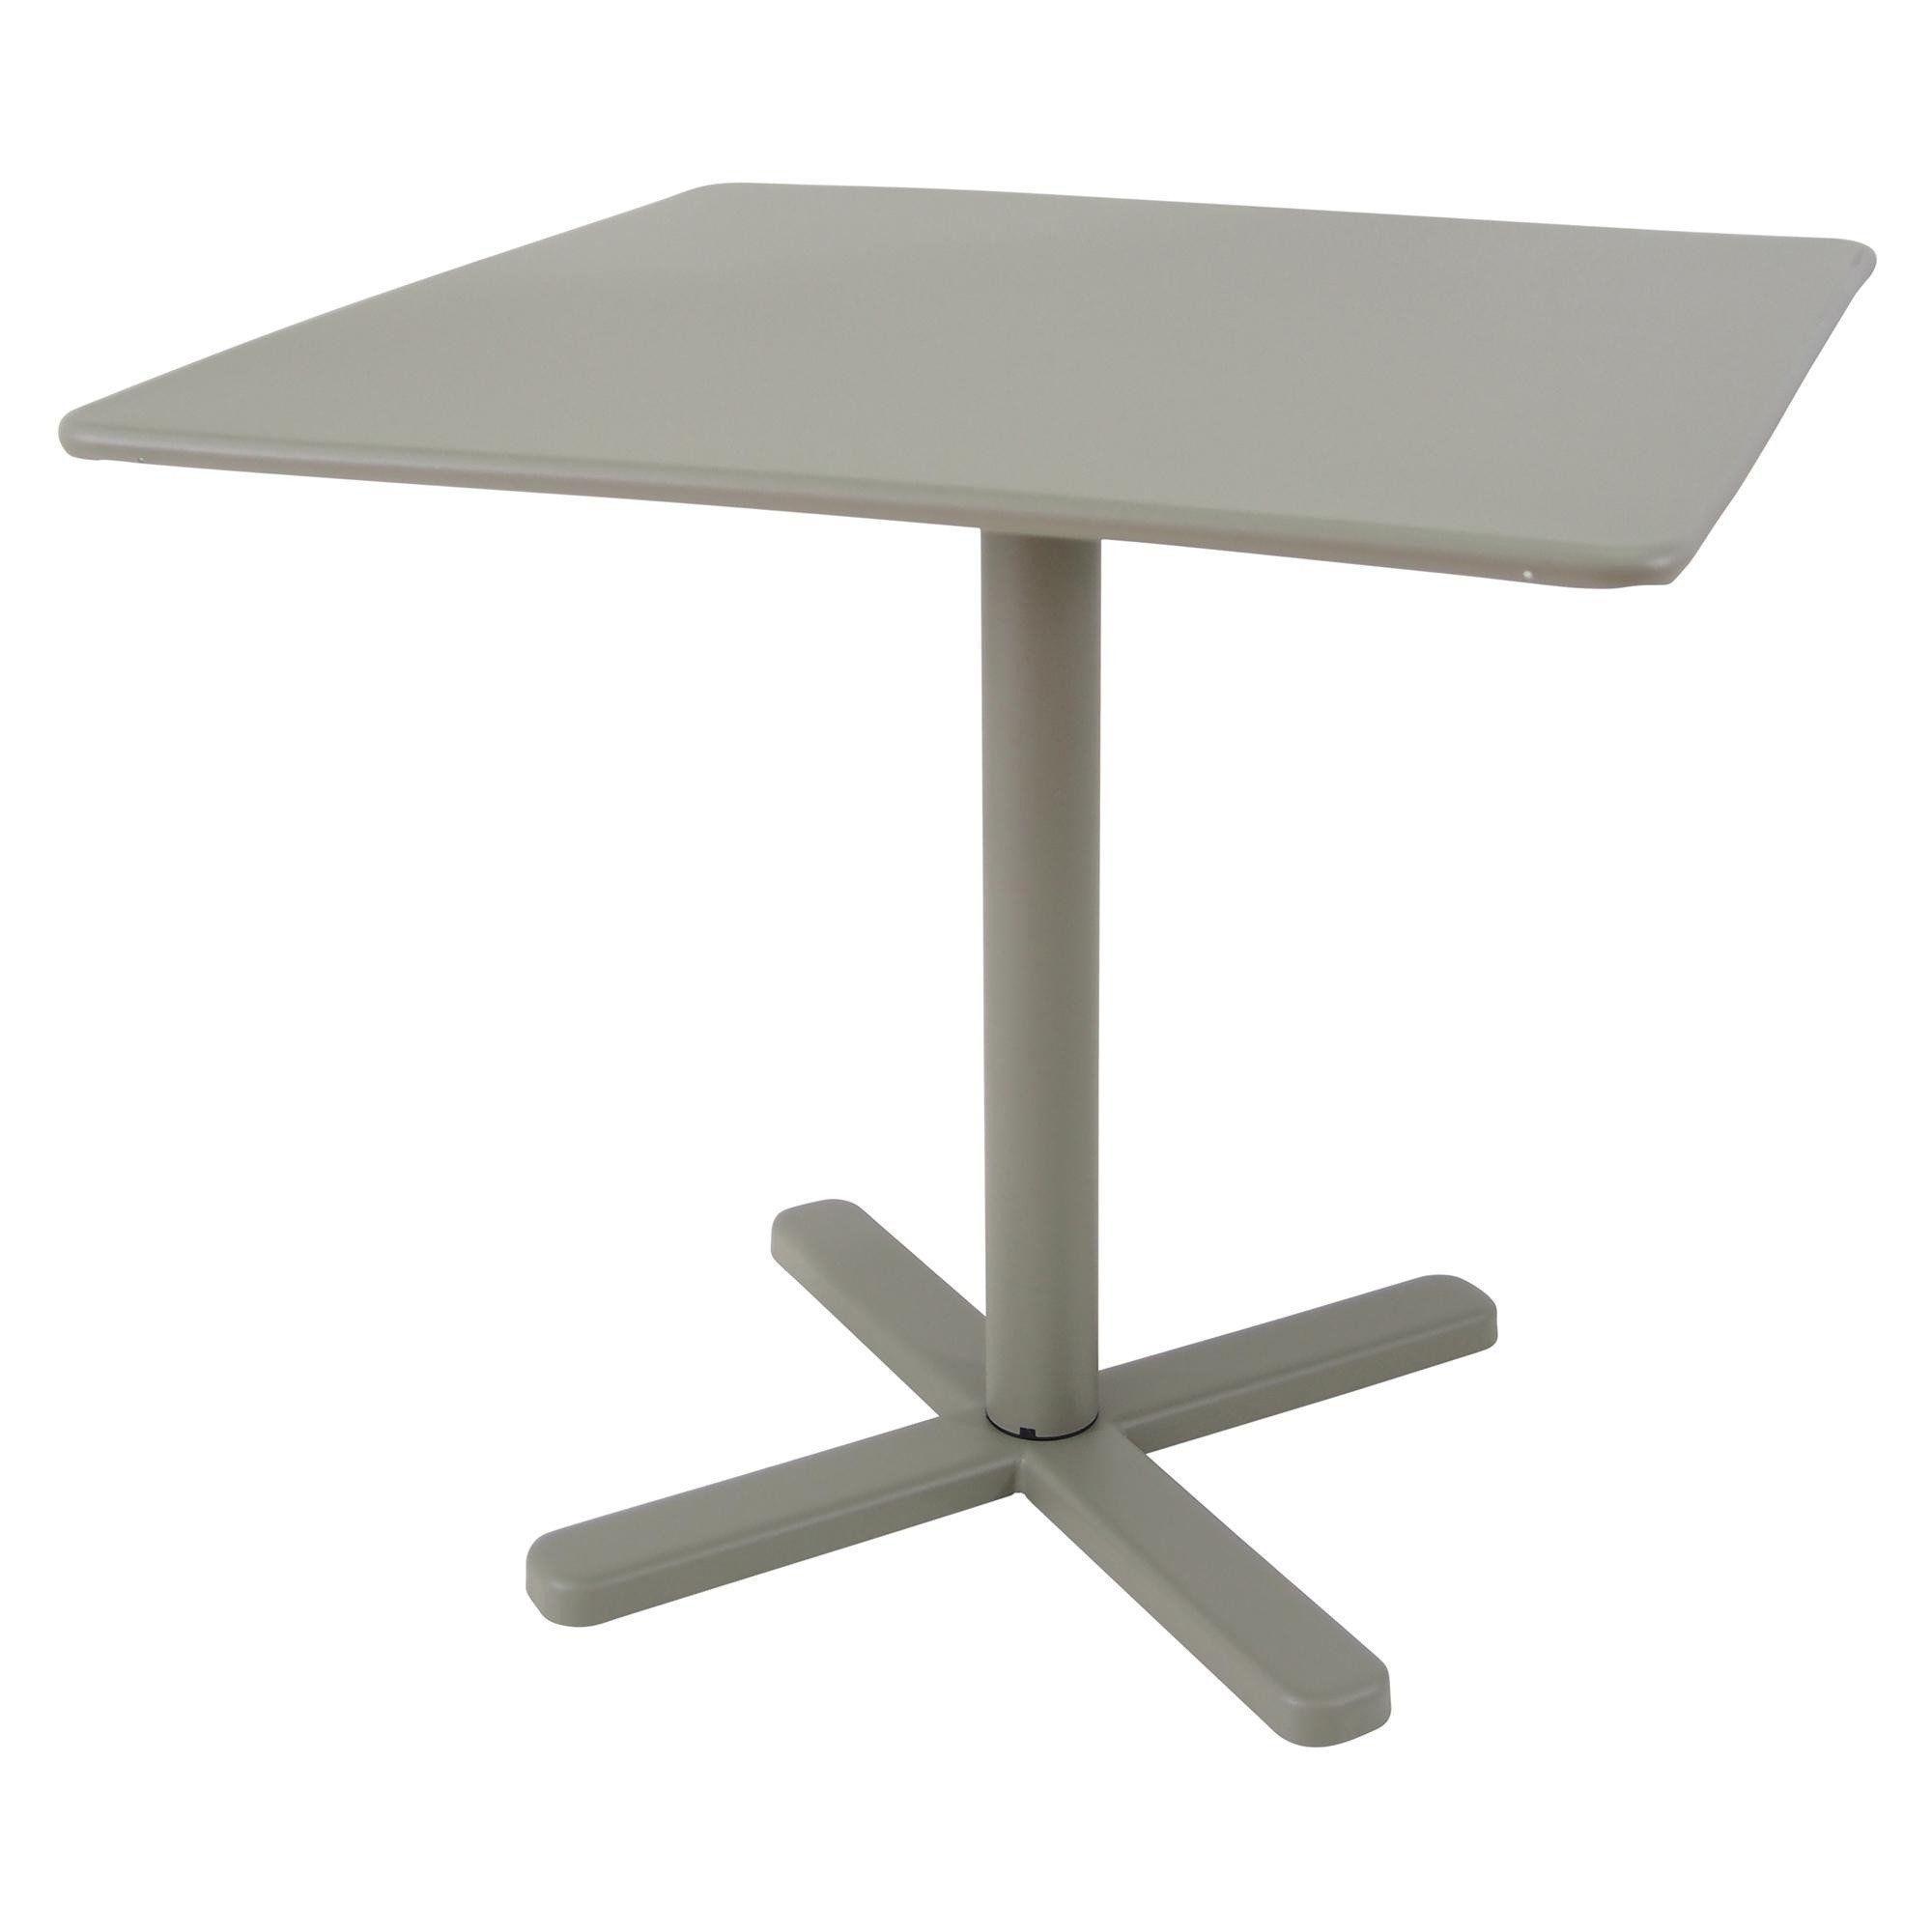 bistro dl us round dining sl website store concrete ton table furniture b lyon